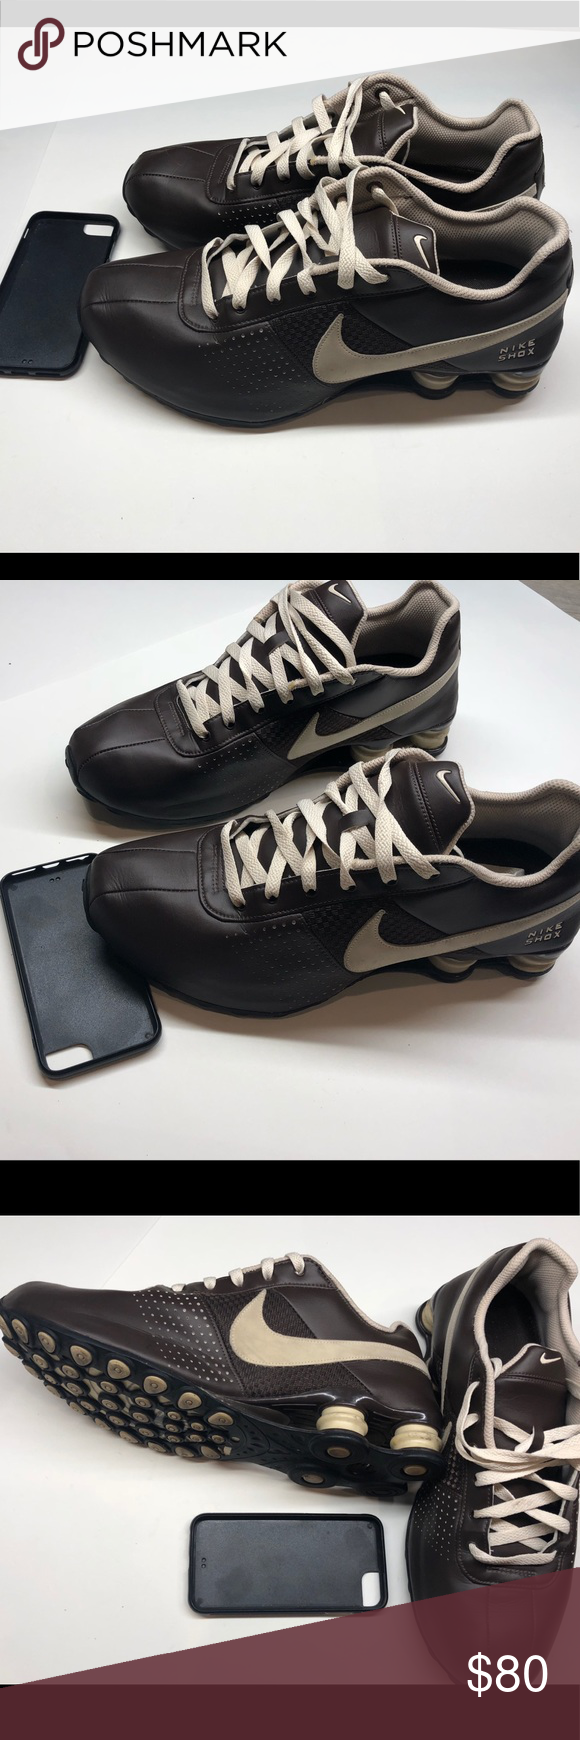 san francisco d7d09 bd9dd Rare Nike Shox Brown and Tan, 10.5 Nike Shox Deliver Chocolate brown with  tan